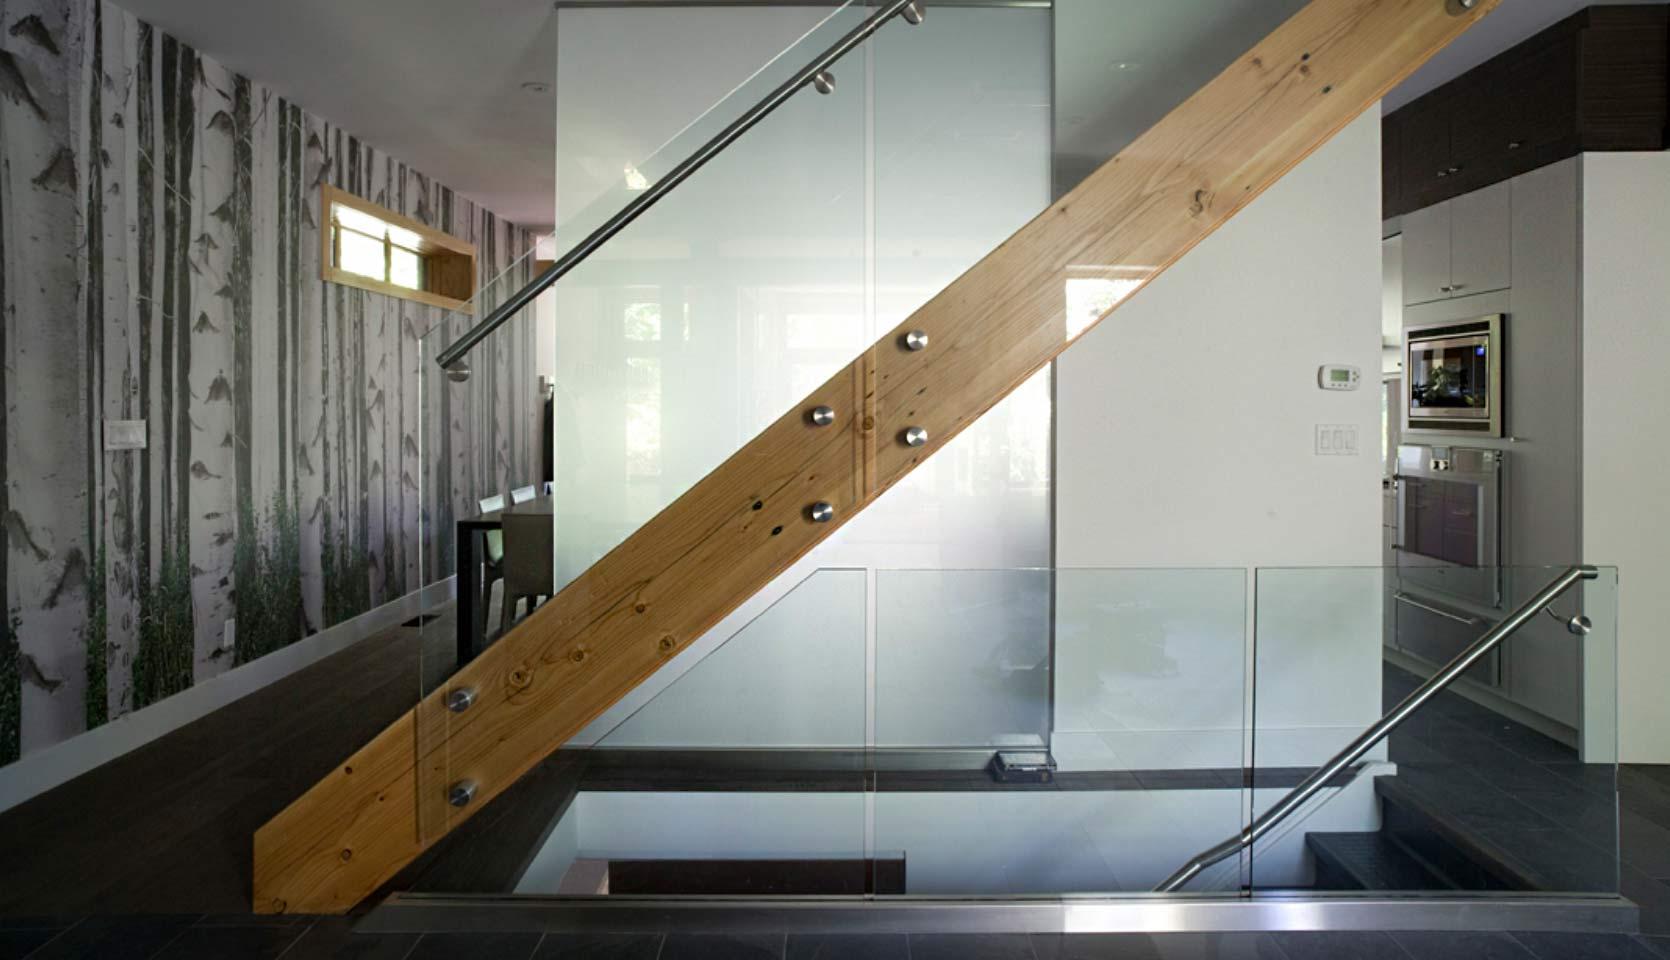 severnwoods-roxborough-house-stairs